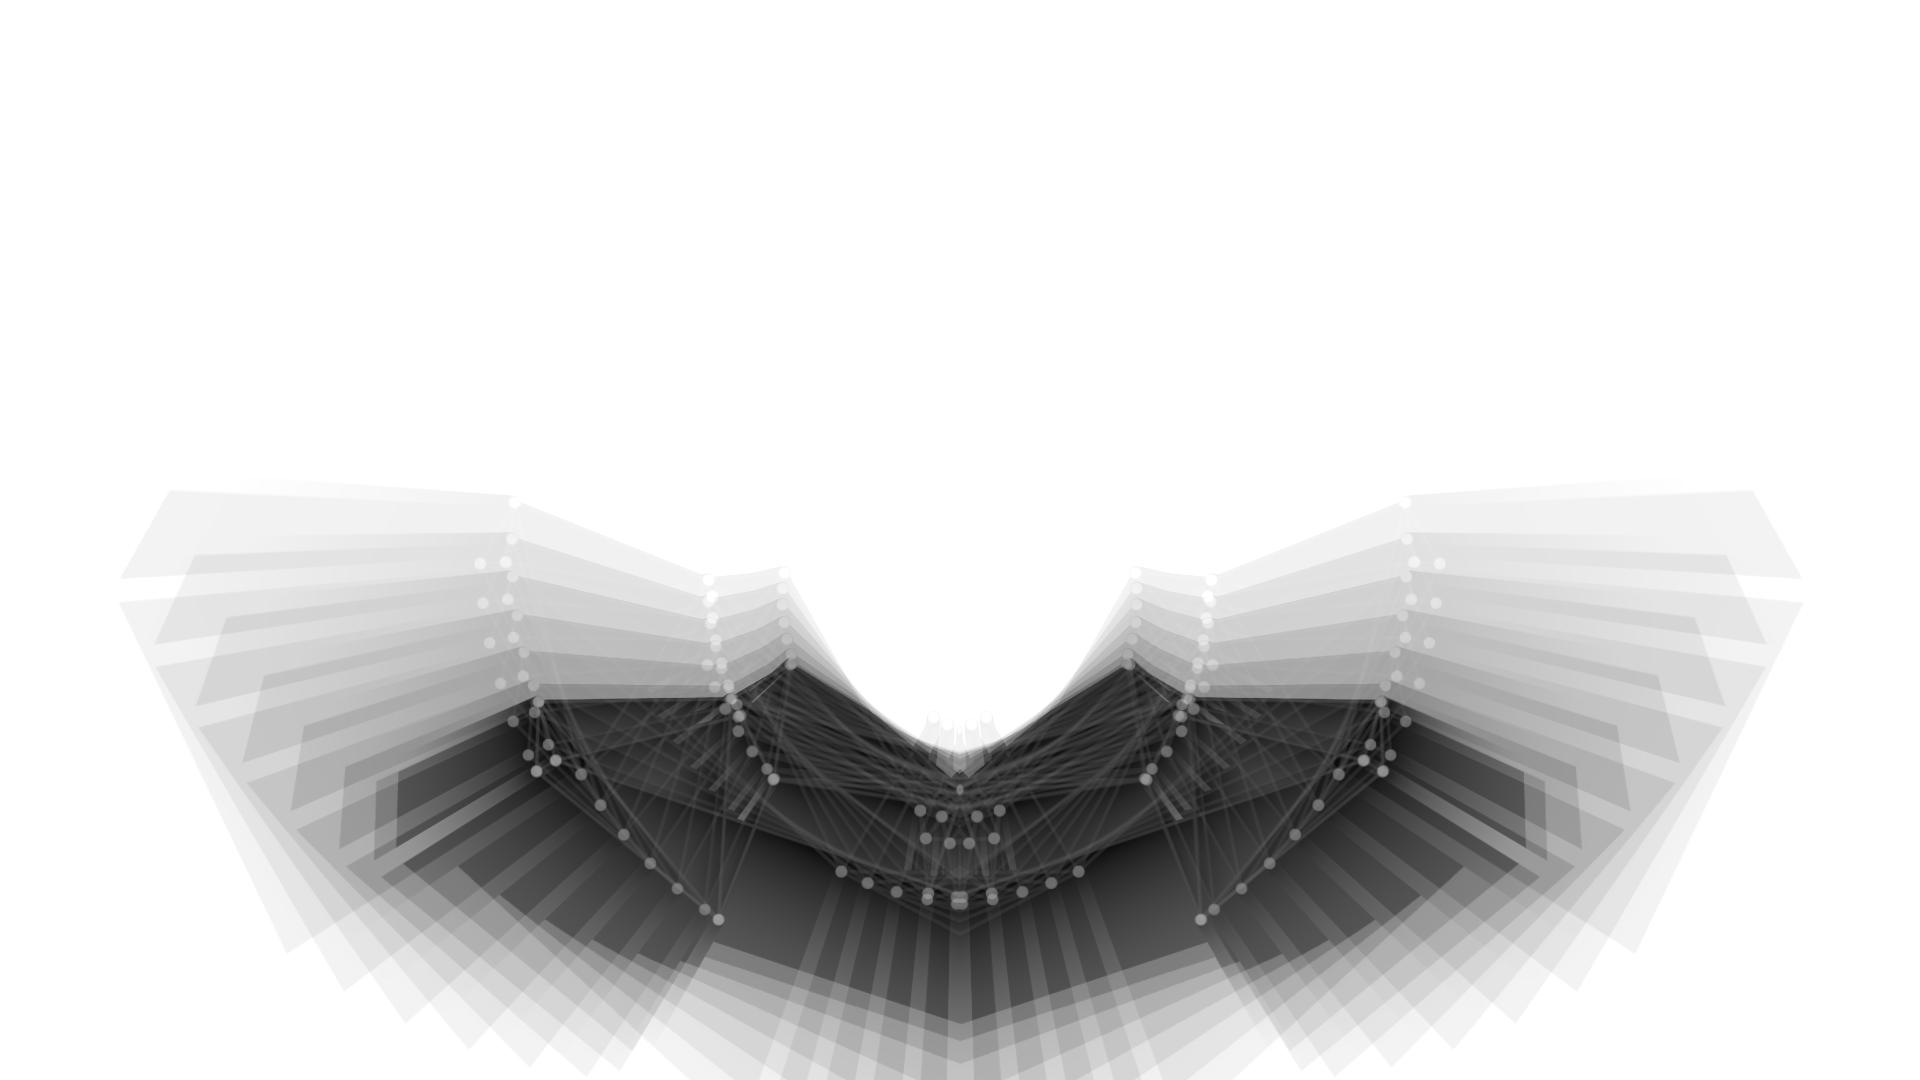 Graphic Design & Motion Graphic Design by PARPUNK haihm's New EP 'P O I N T 9' 'Bird No Singing' Music Video & Trailer 2014.05